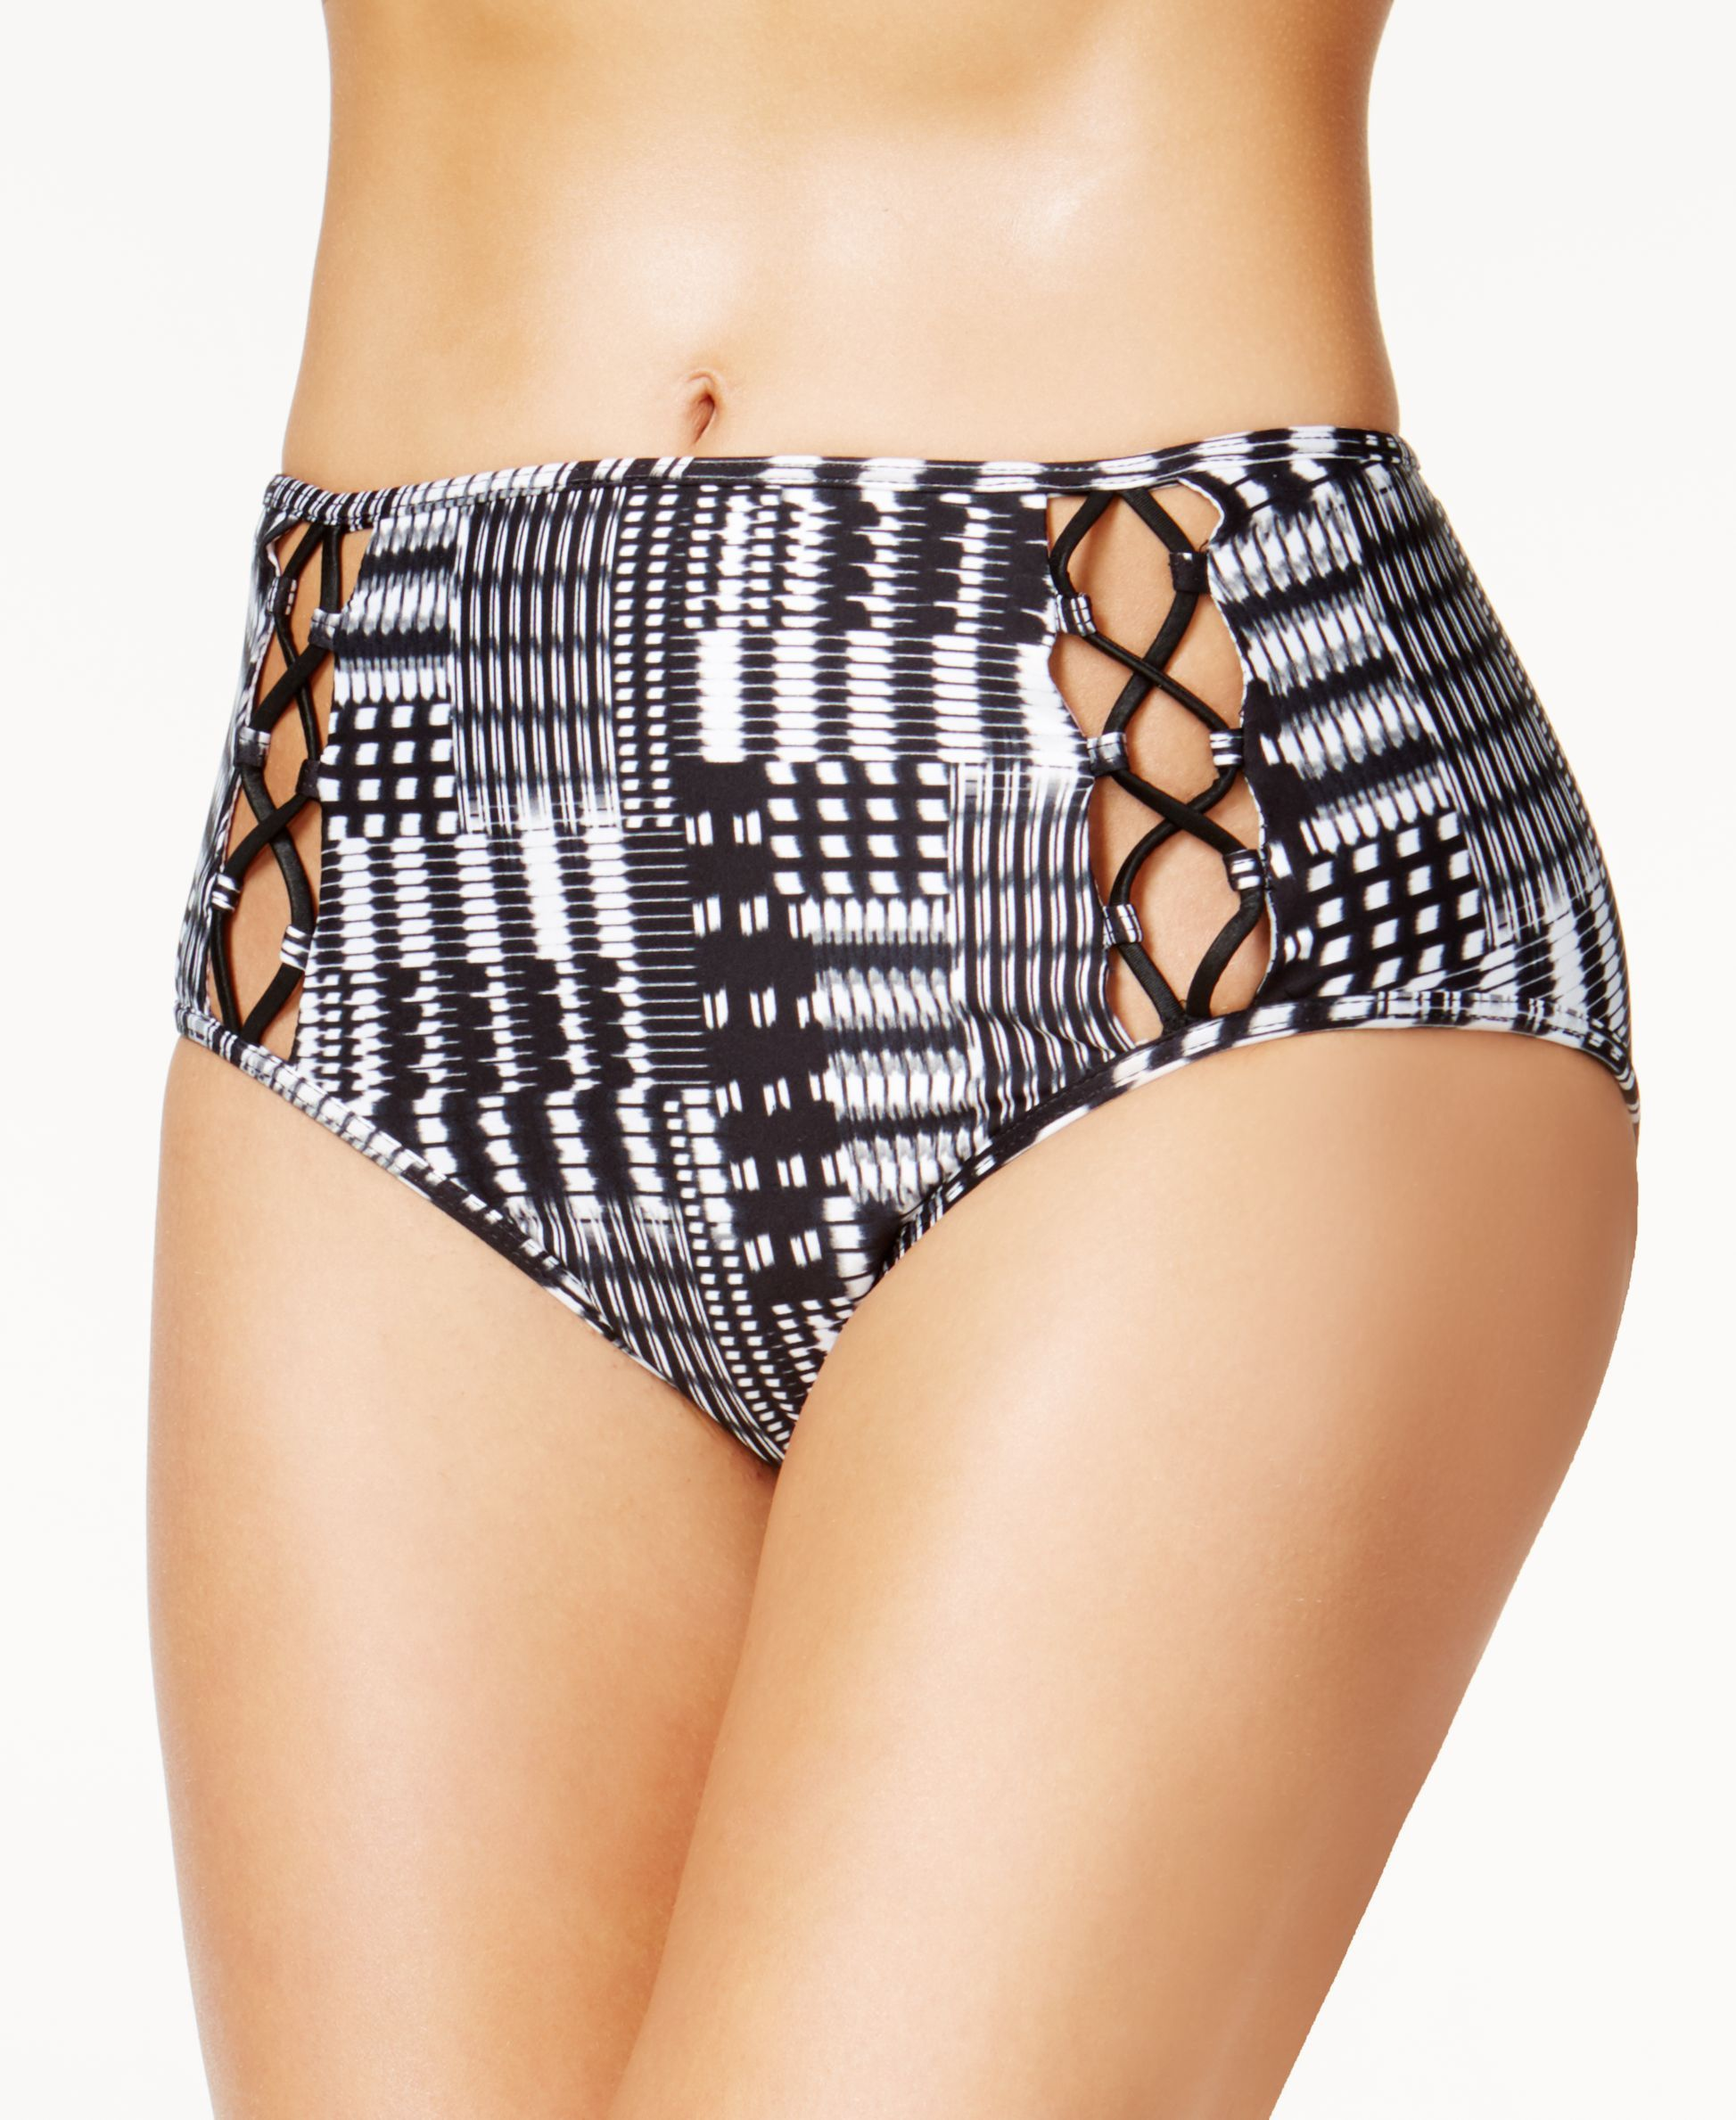 6d583c615b7 Kenneth Cole After Midnight Printed Strappy High-Waist Tummy Control Bikini  Bottoms